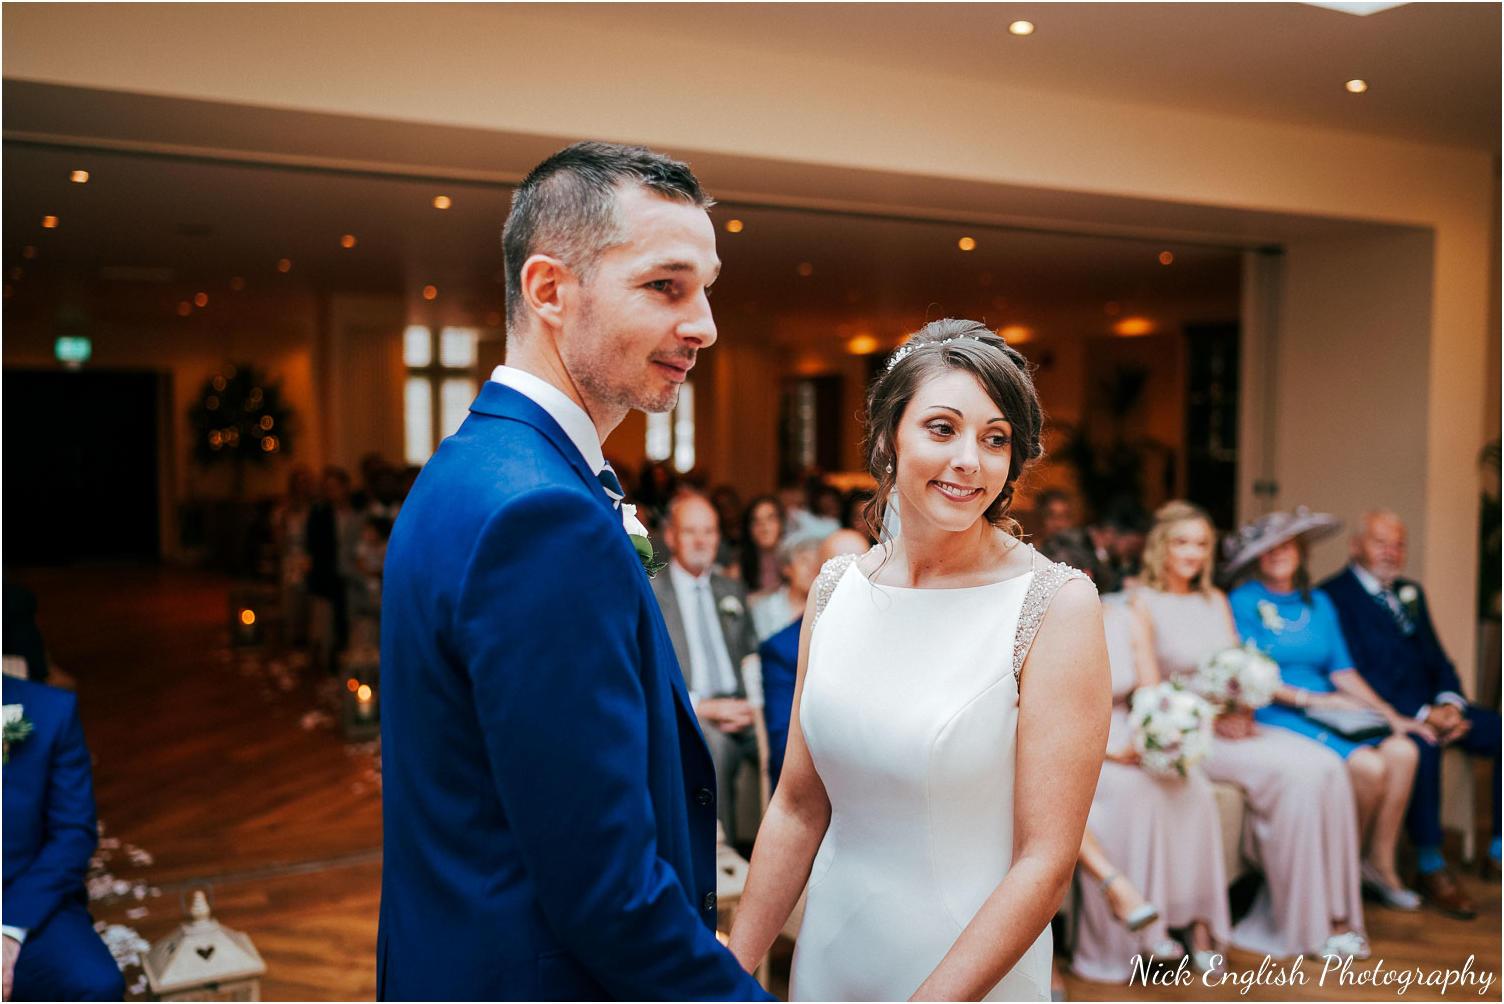 Mitton_Hall_Wedding_Summer_Photograph-47.jpg